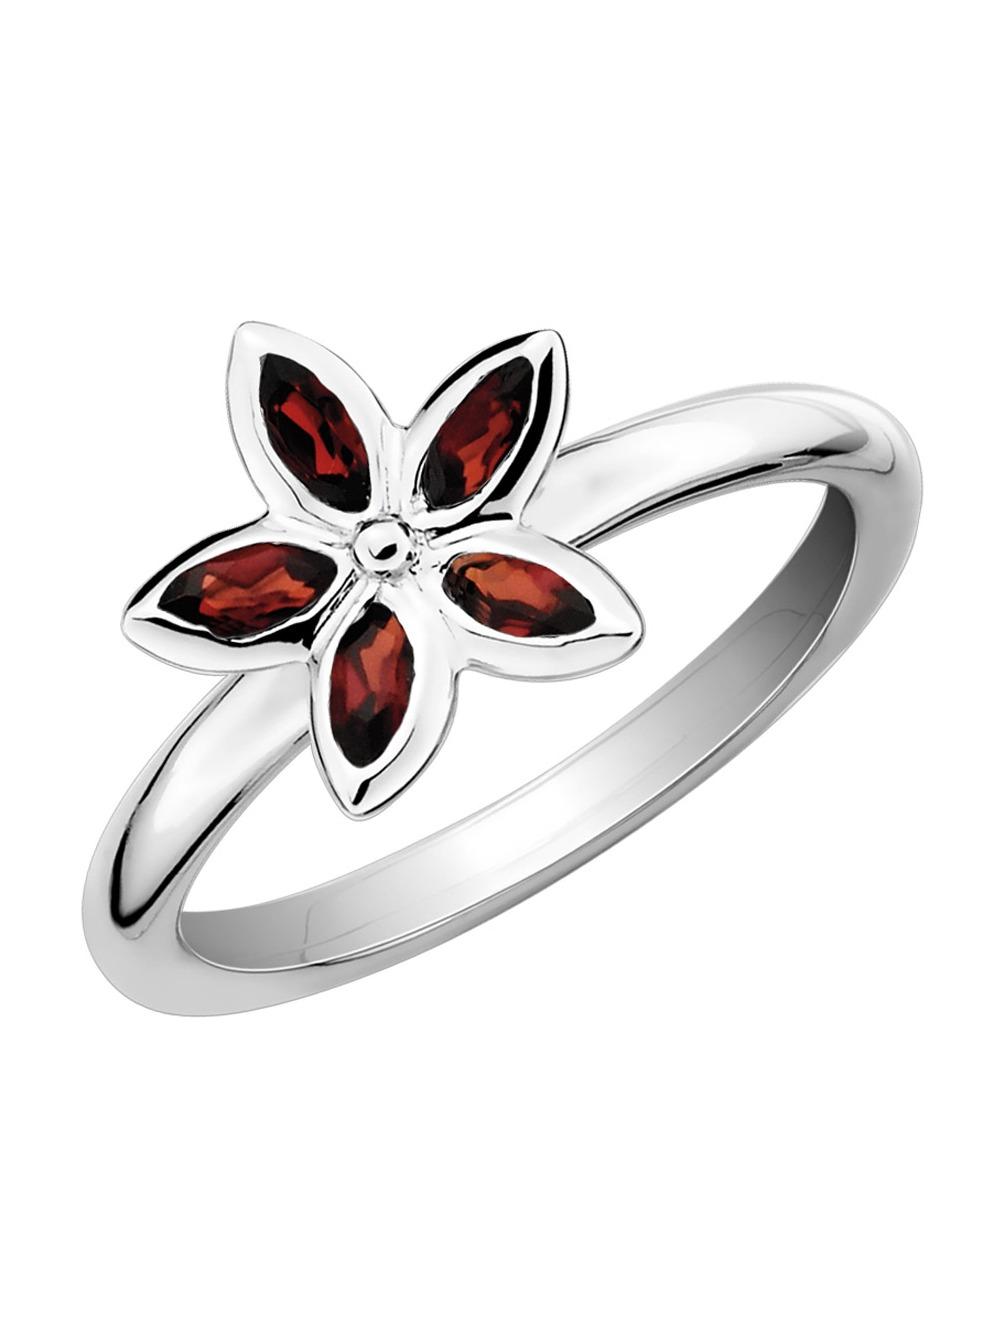 Garnet Flower Ring 1/3 Carat (ctw) in Sterling Silver